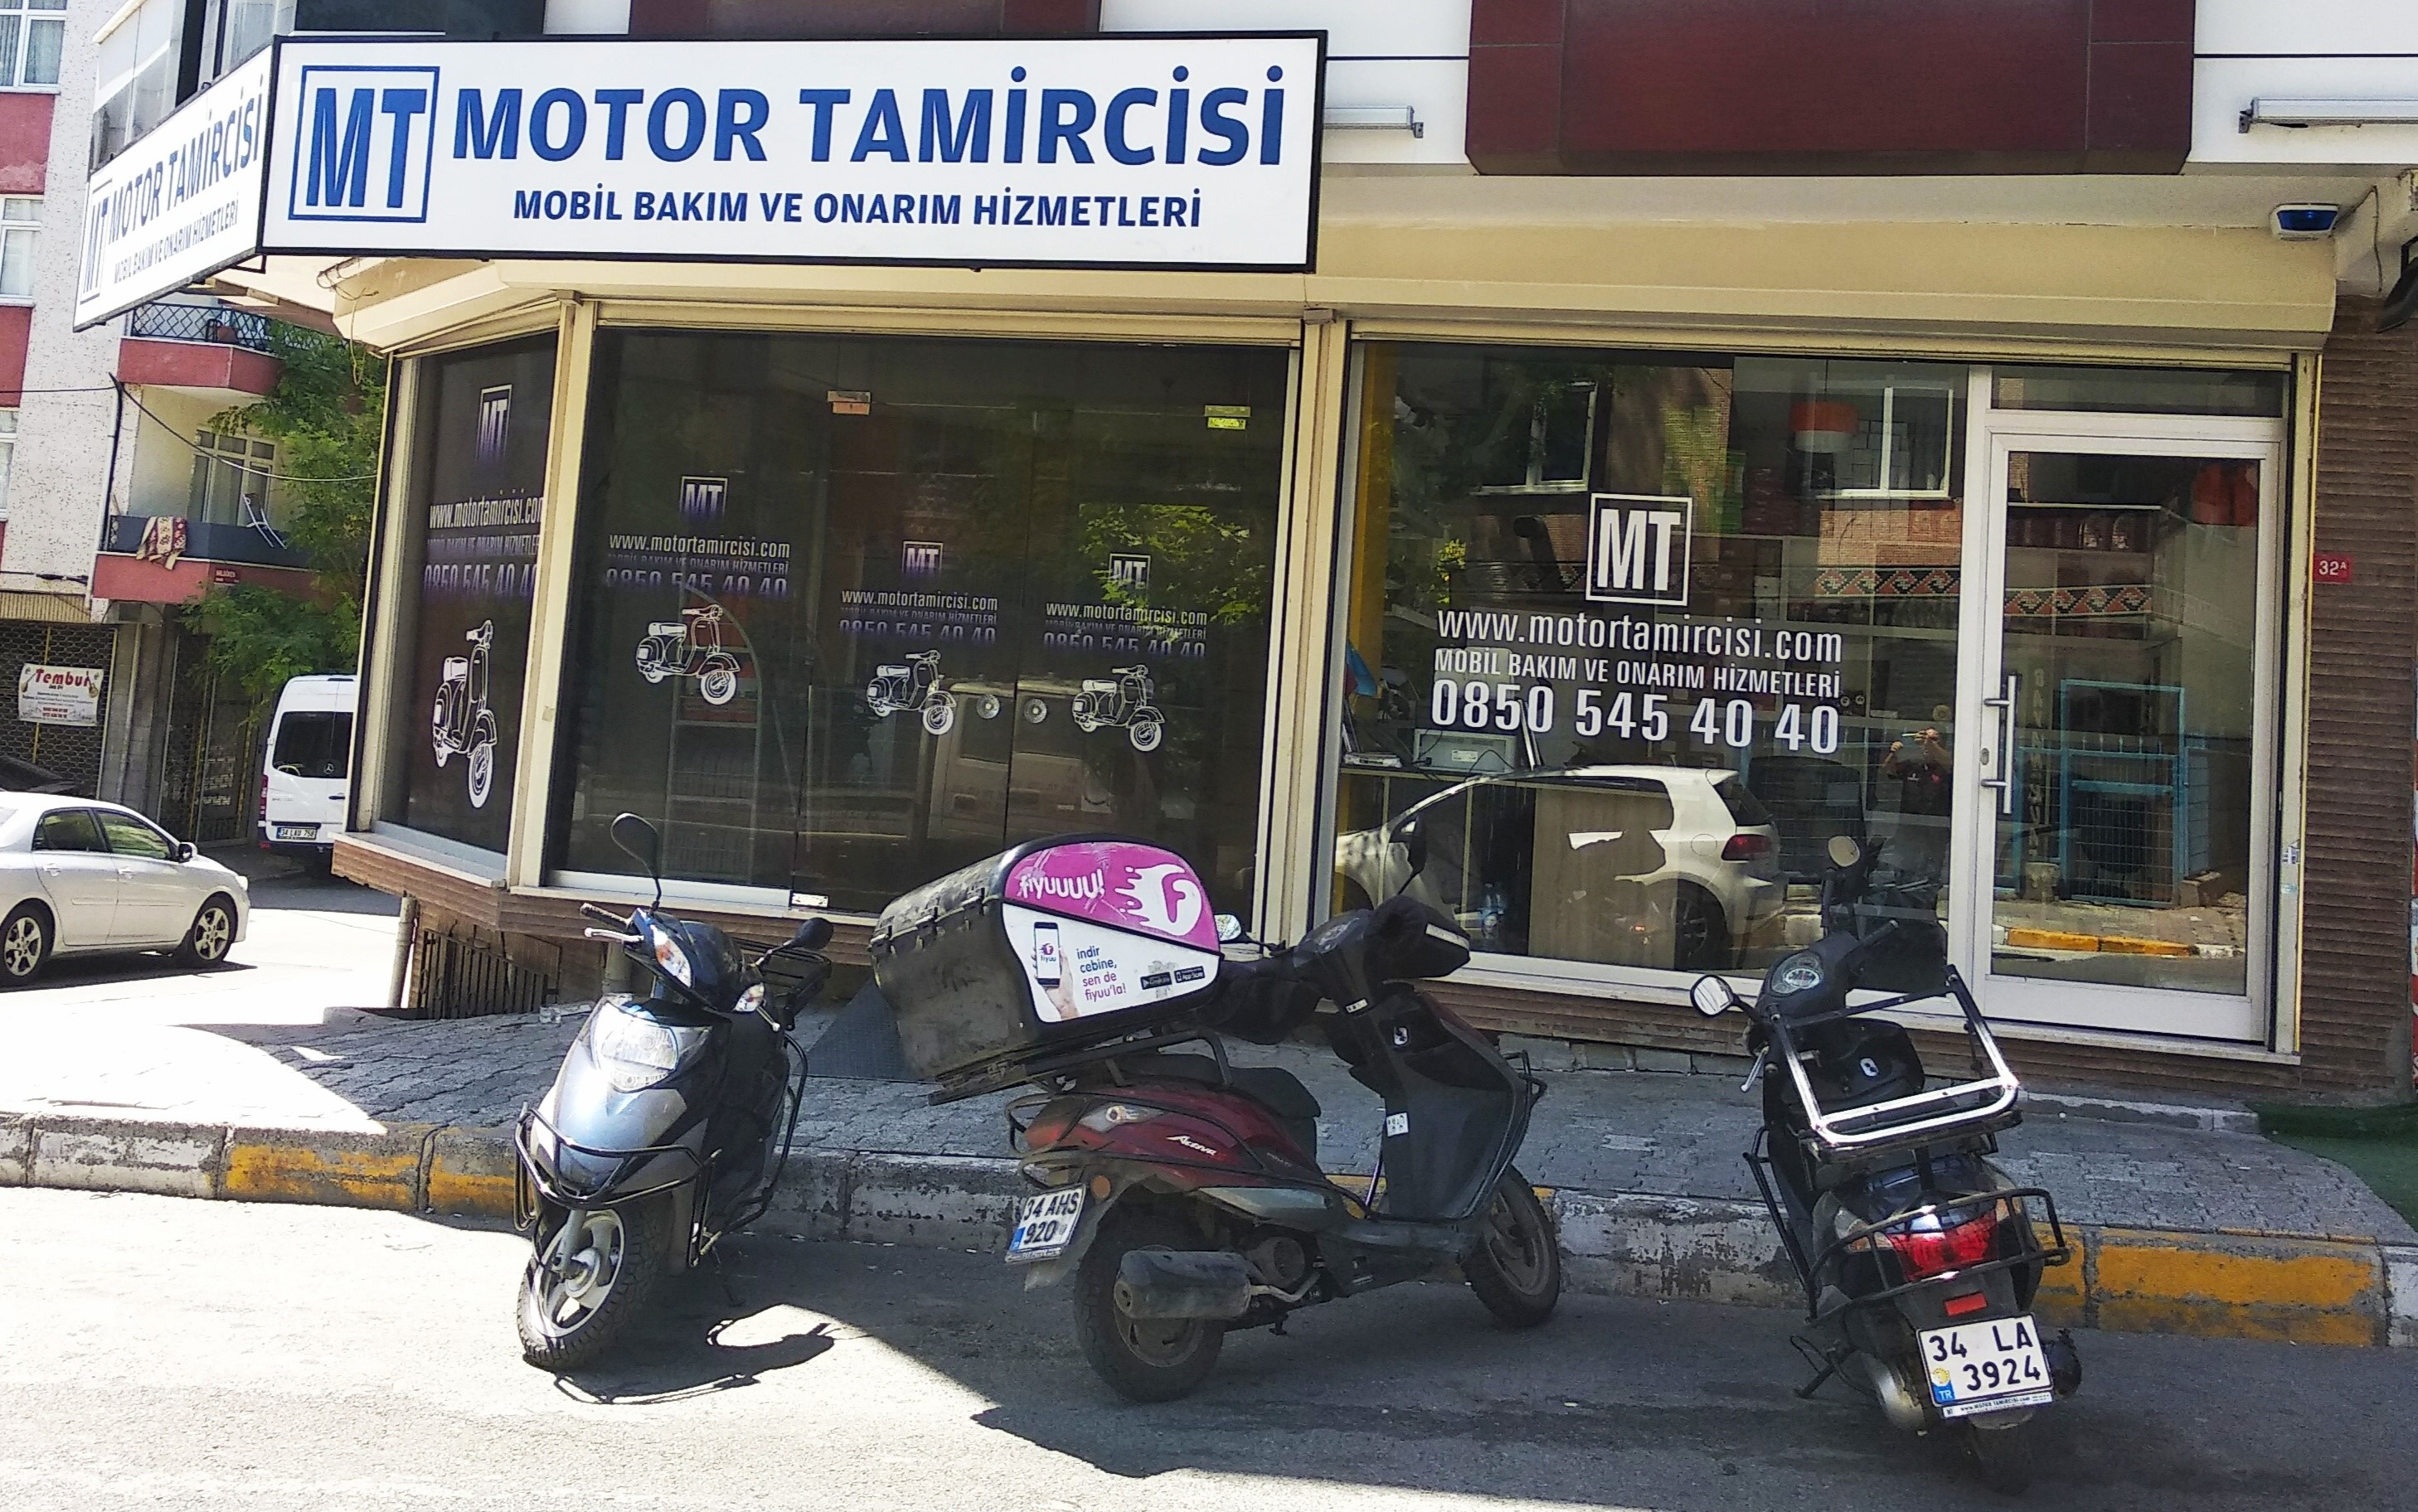 motor tamircisi servis bakım hizmetleri motor kiralama